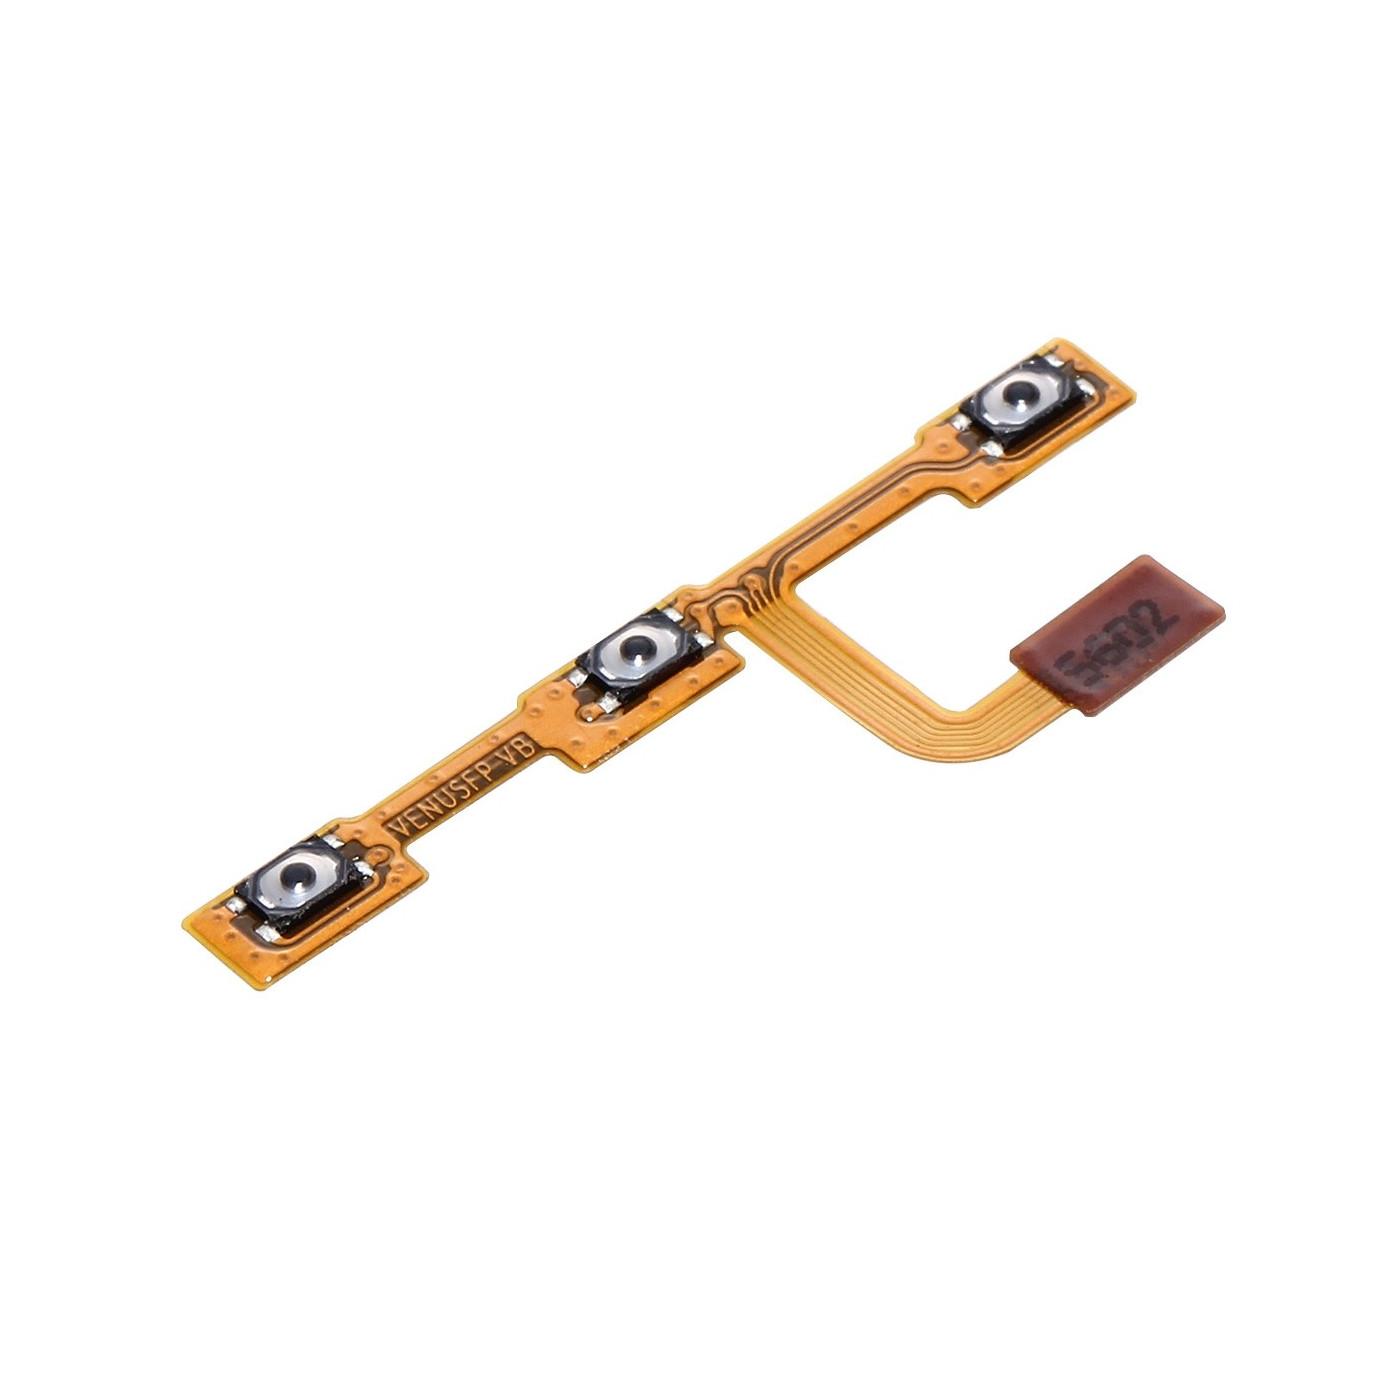 Flat flex Huawei P9 Lite tasto tasti power volume muto on off accenzione